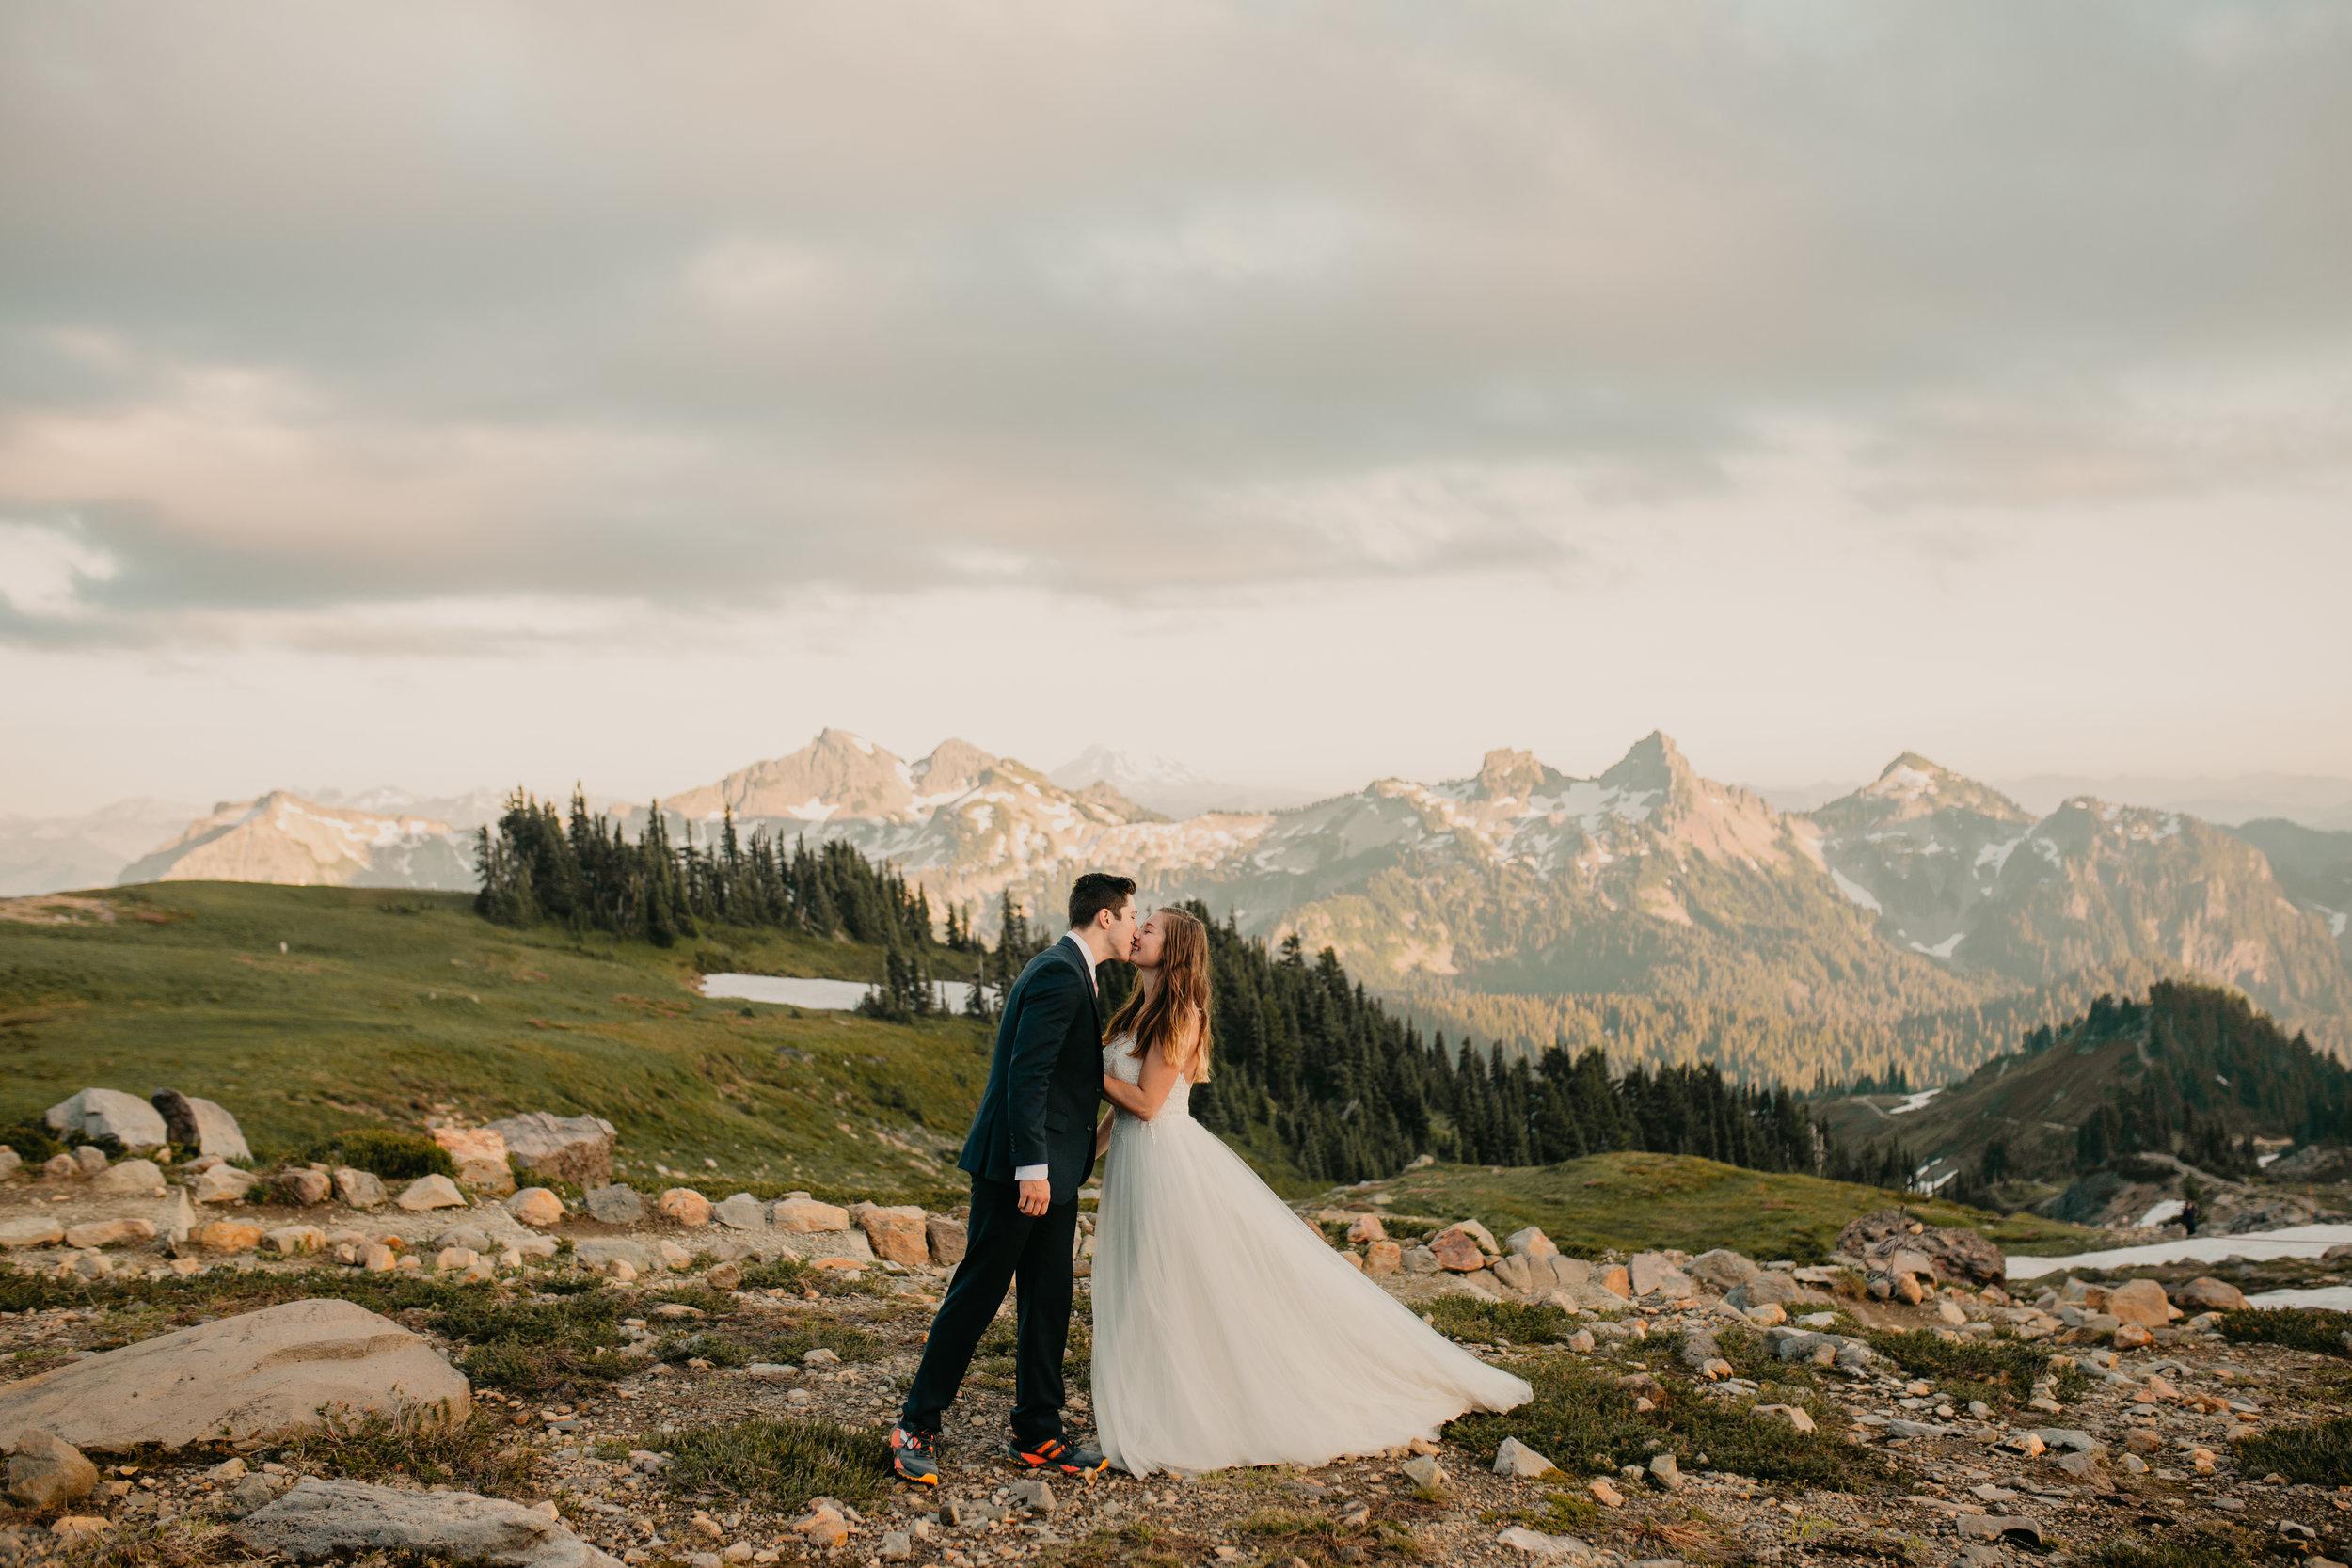 Nicole-Daacke-Photography-Mt-Rainier-elopement-photographer-washington-mountain-epic-wedding-photography-wildflowers-at-rainier-pine-tree-cloudy-summer-day-at-mountain-rainier-44.jpg